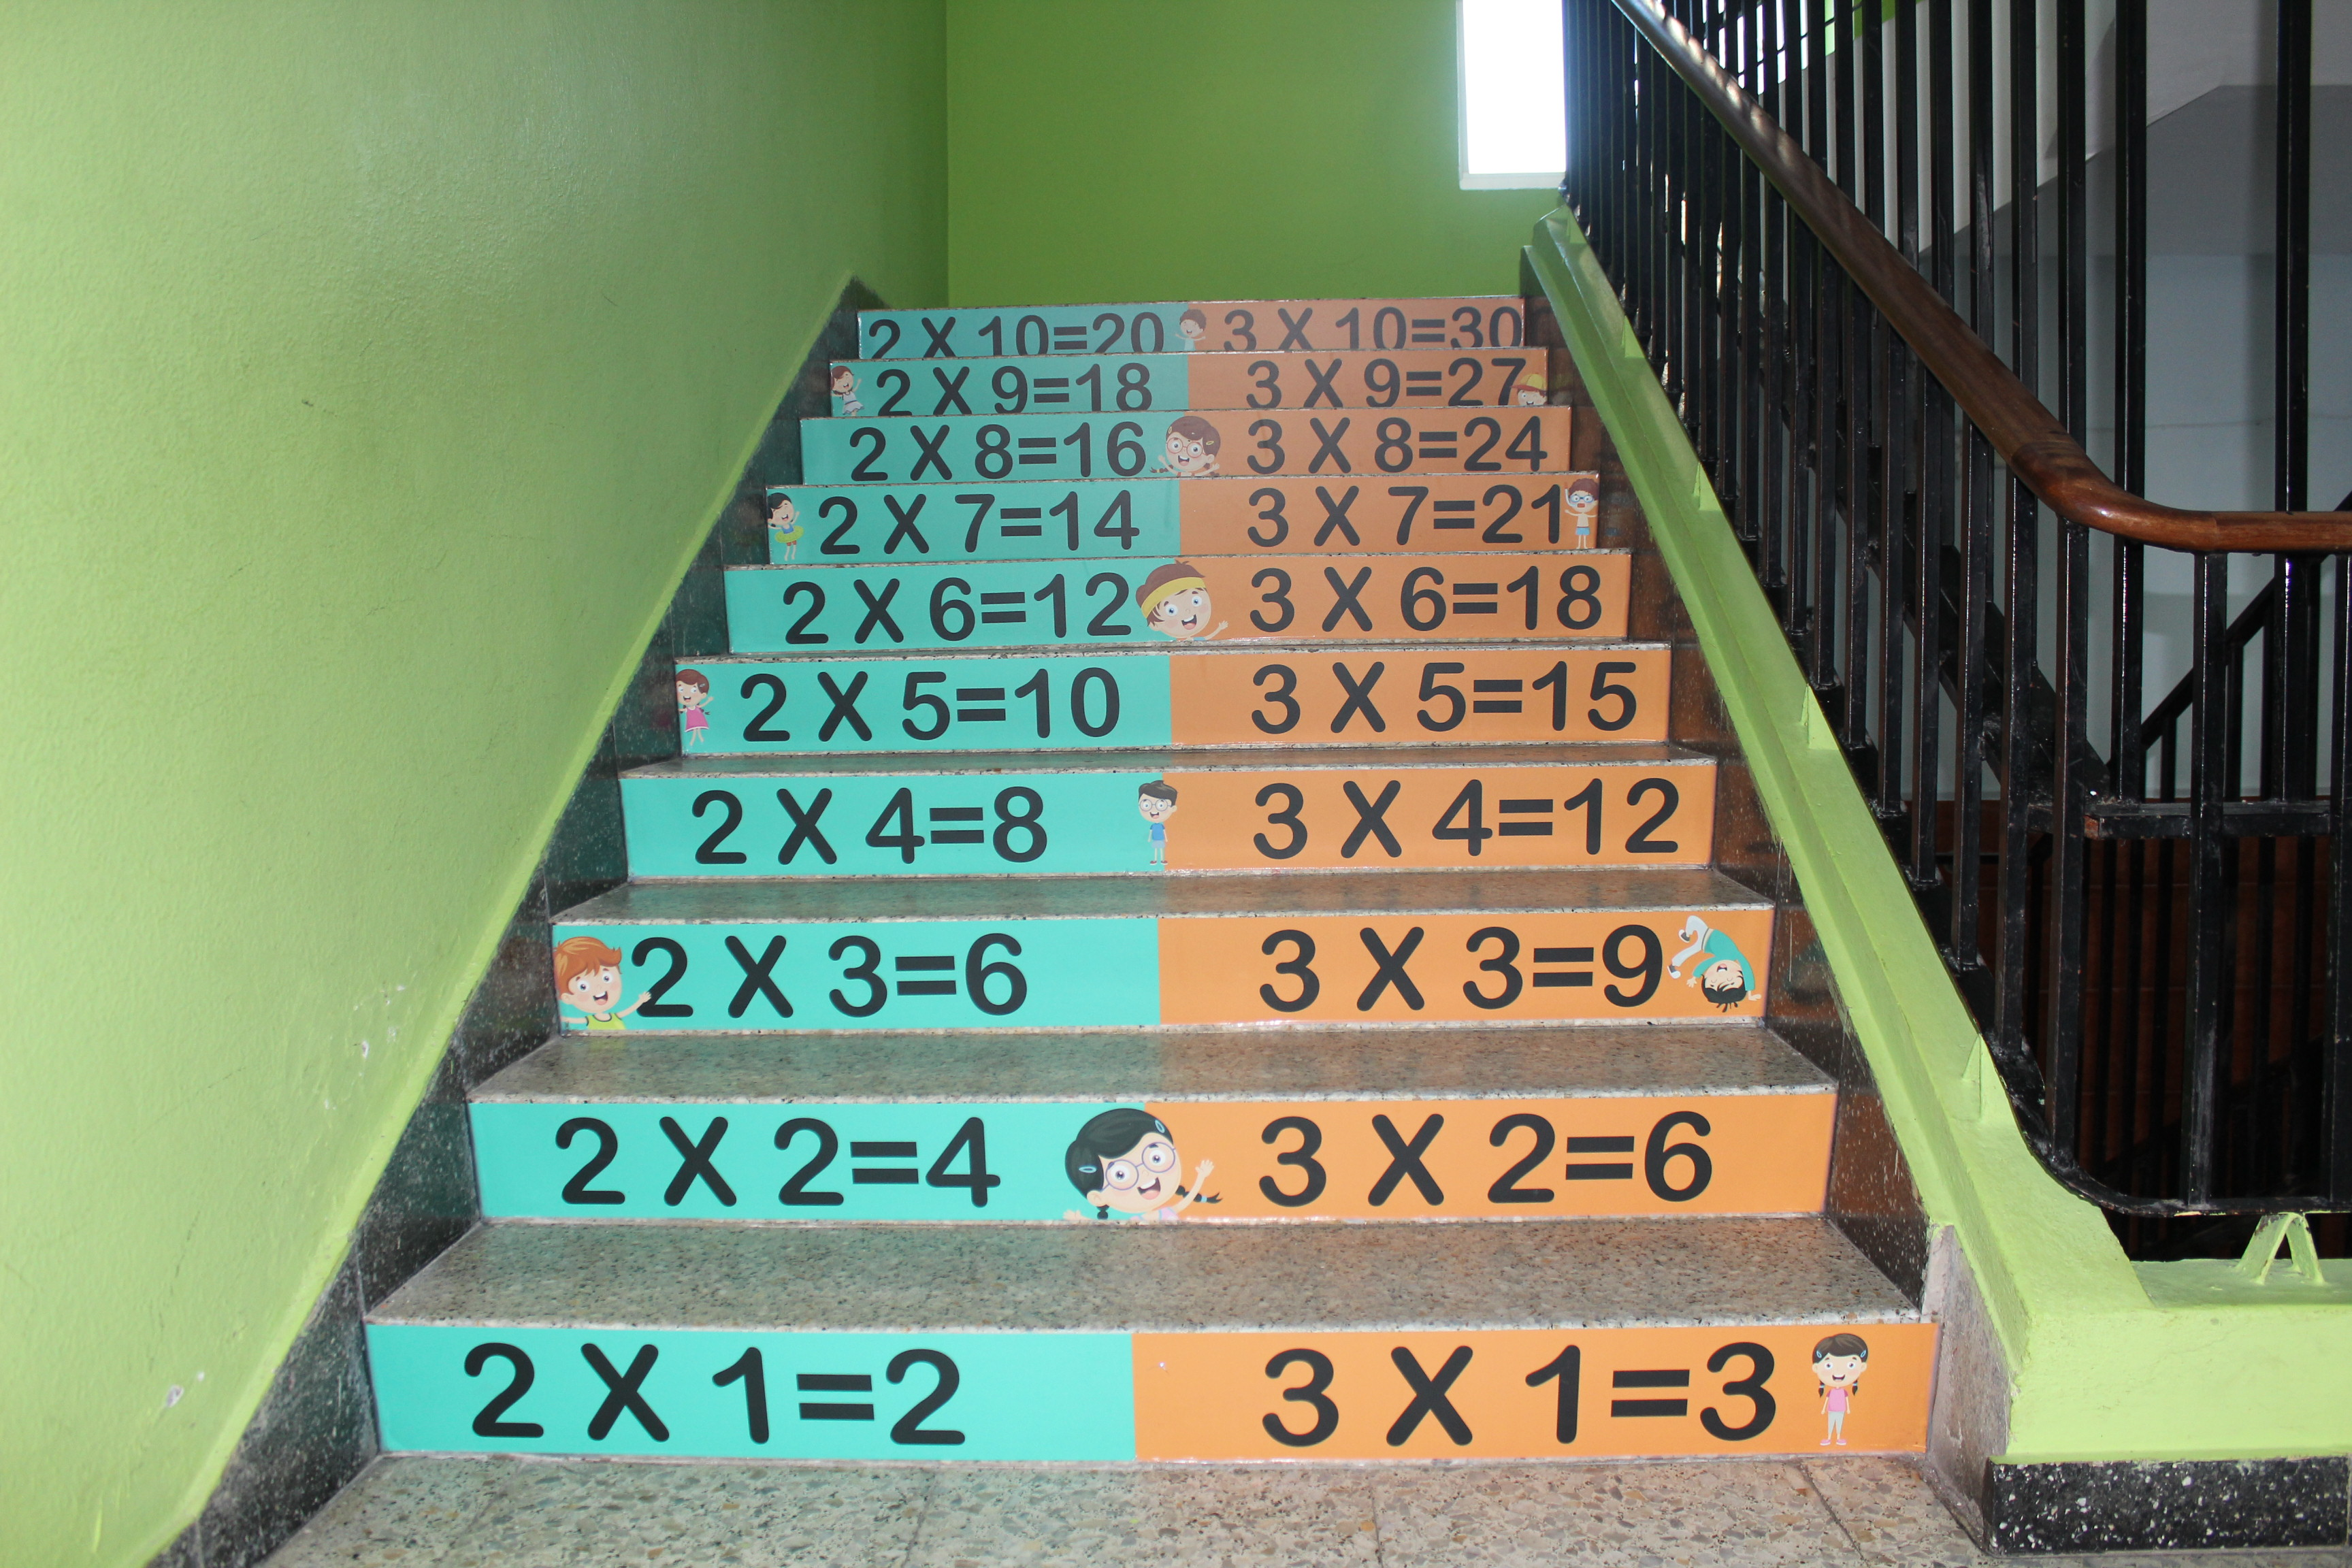 vinilo escaleras colegio tablas